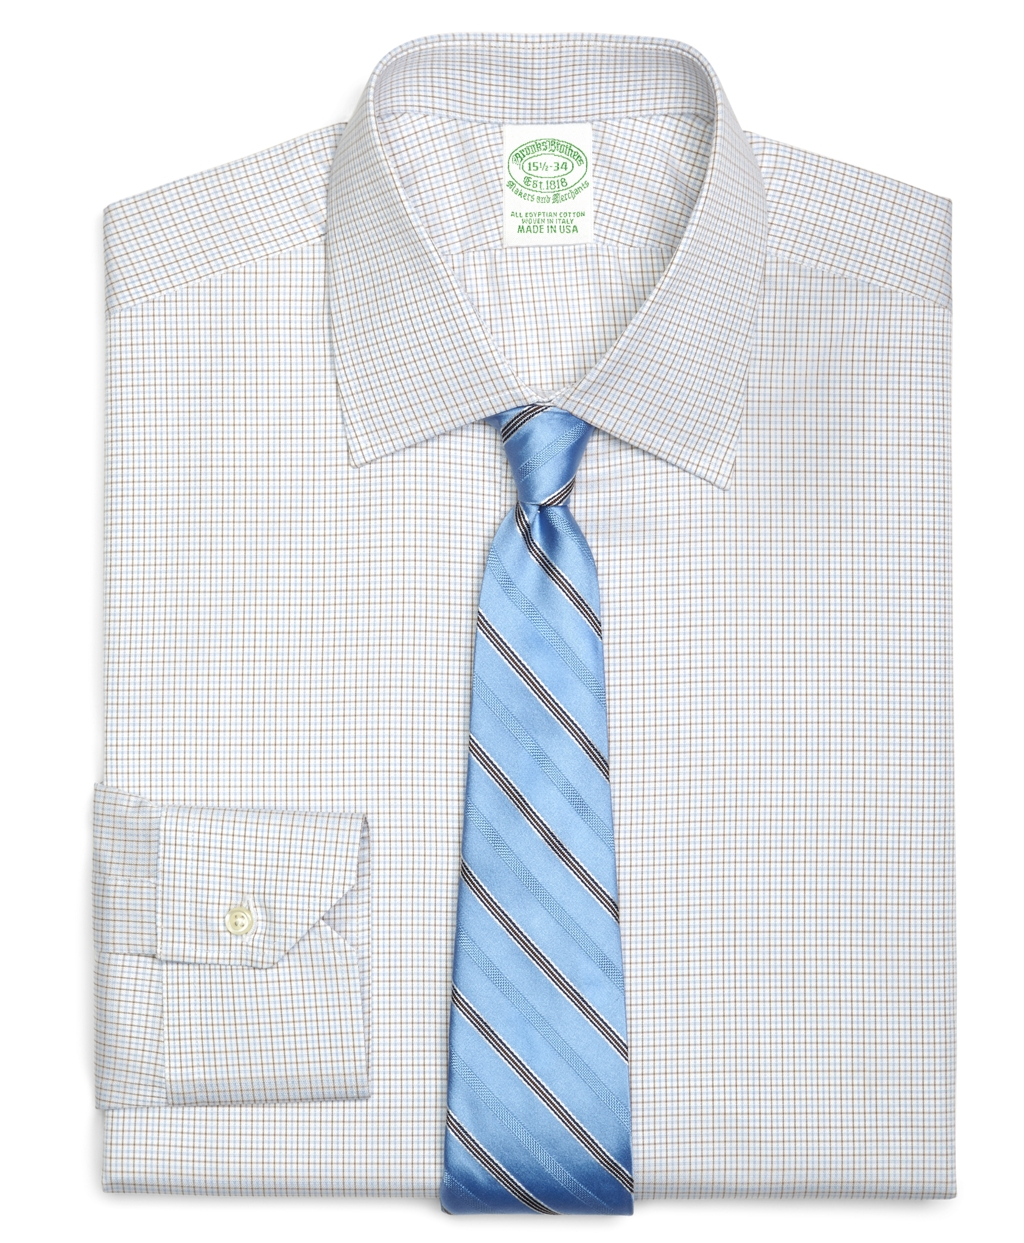 Brooks brothers regular fit small tattersall dress shirt Brooks brothers shirt size guide